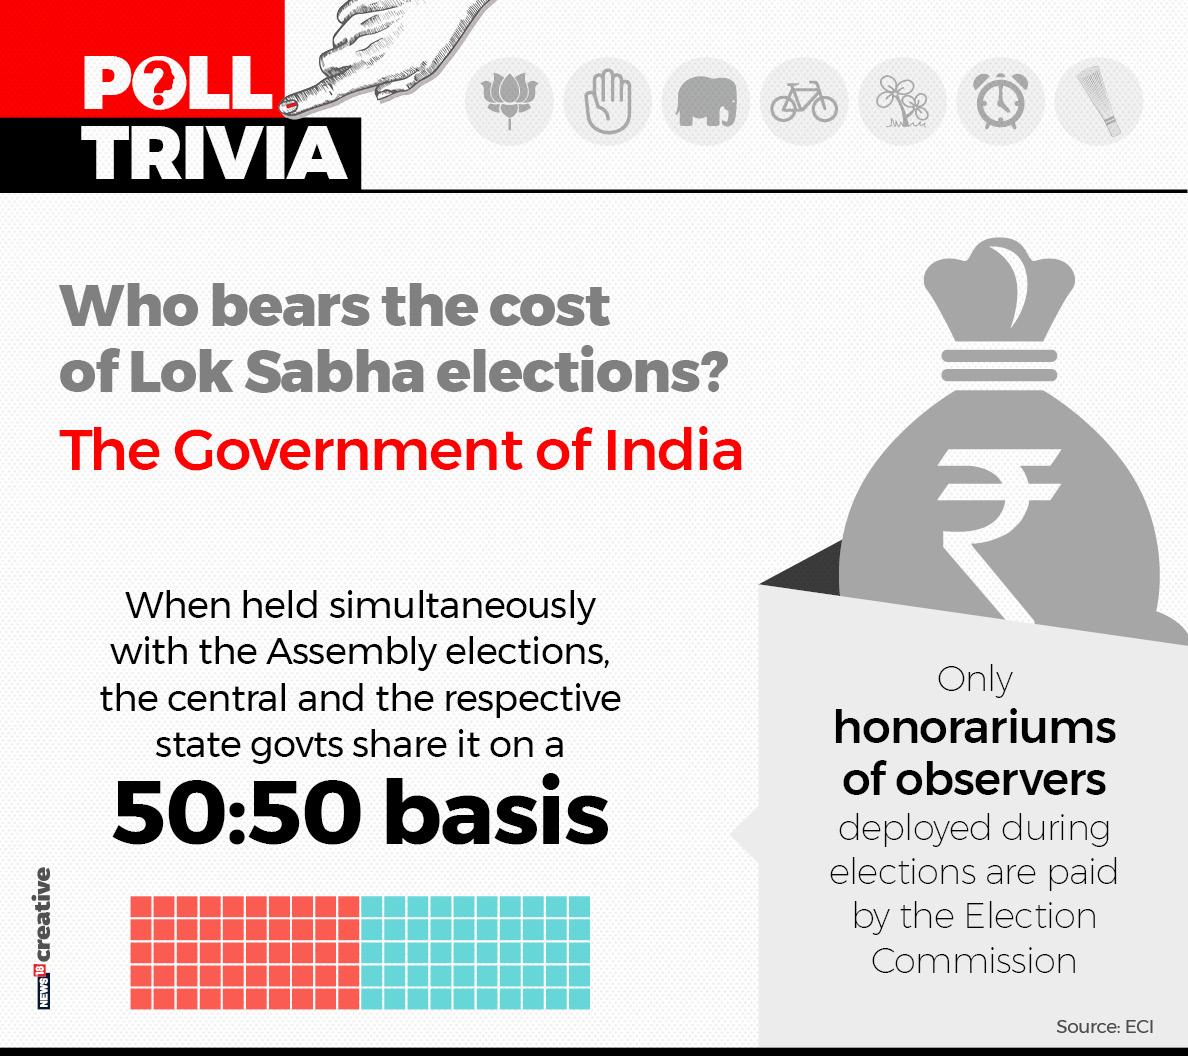 Who bears the cost of Lok Sabha elections?